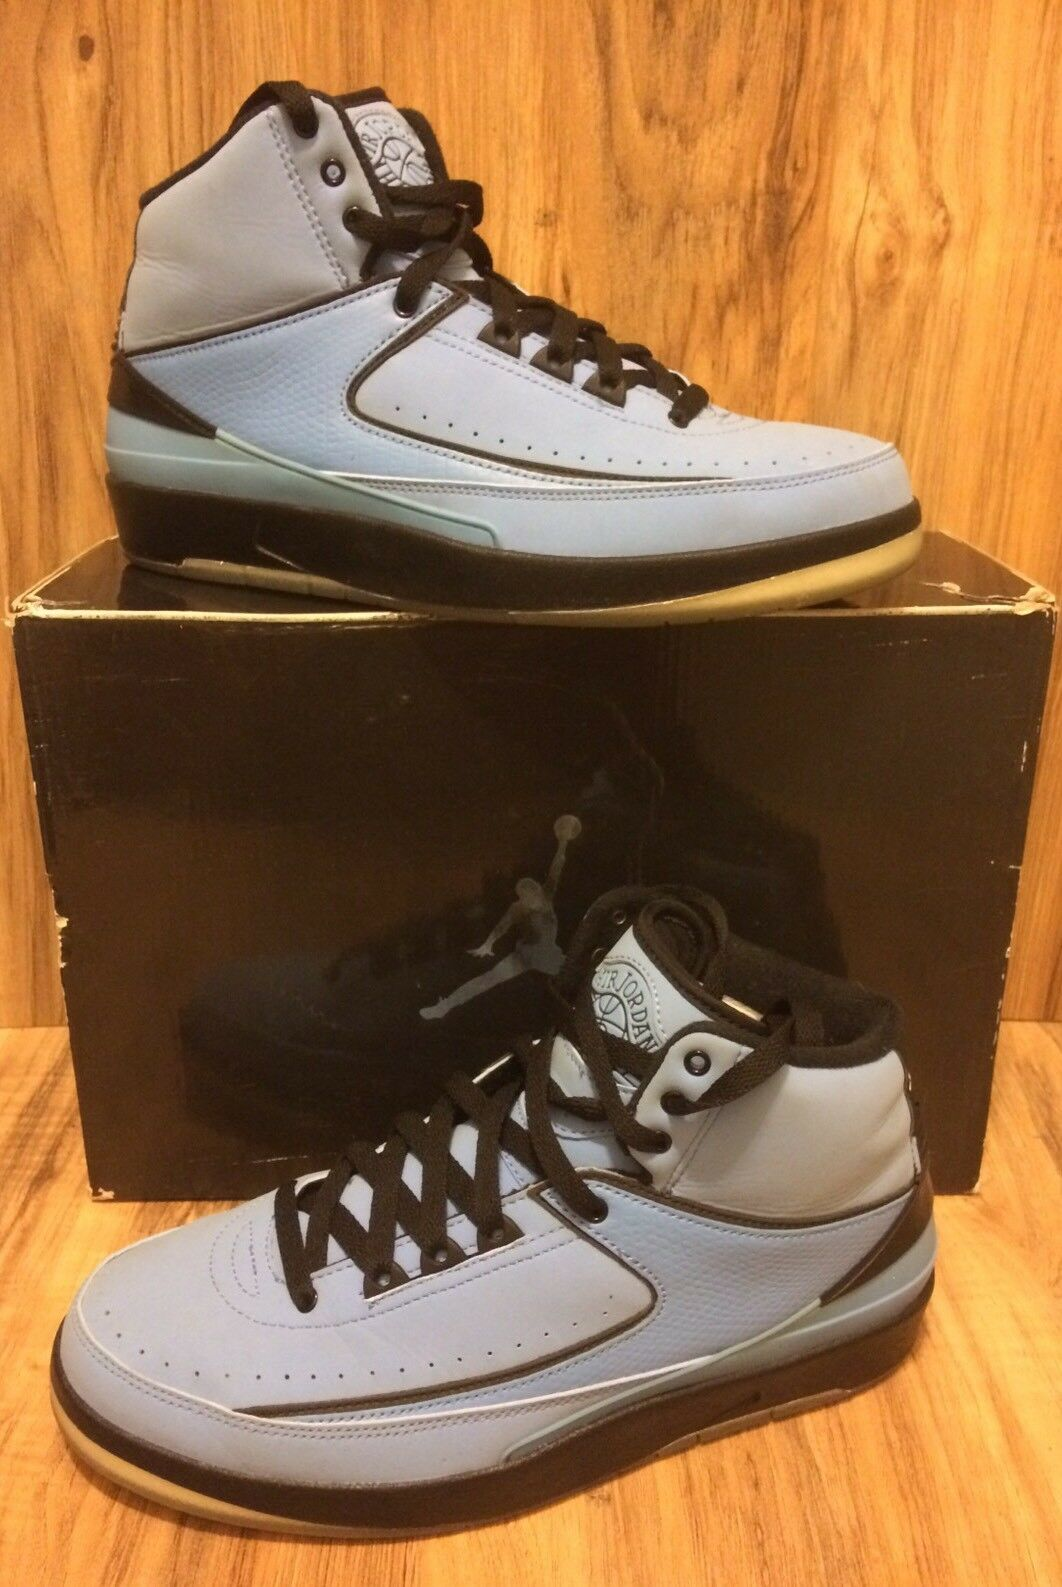 2010 Nike Air Jordan Retro QF QF QF 2 University bluee UNC Size 8.5 395709-401 1891a9